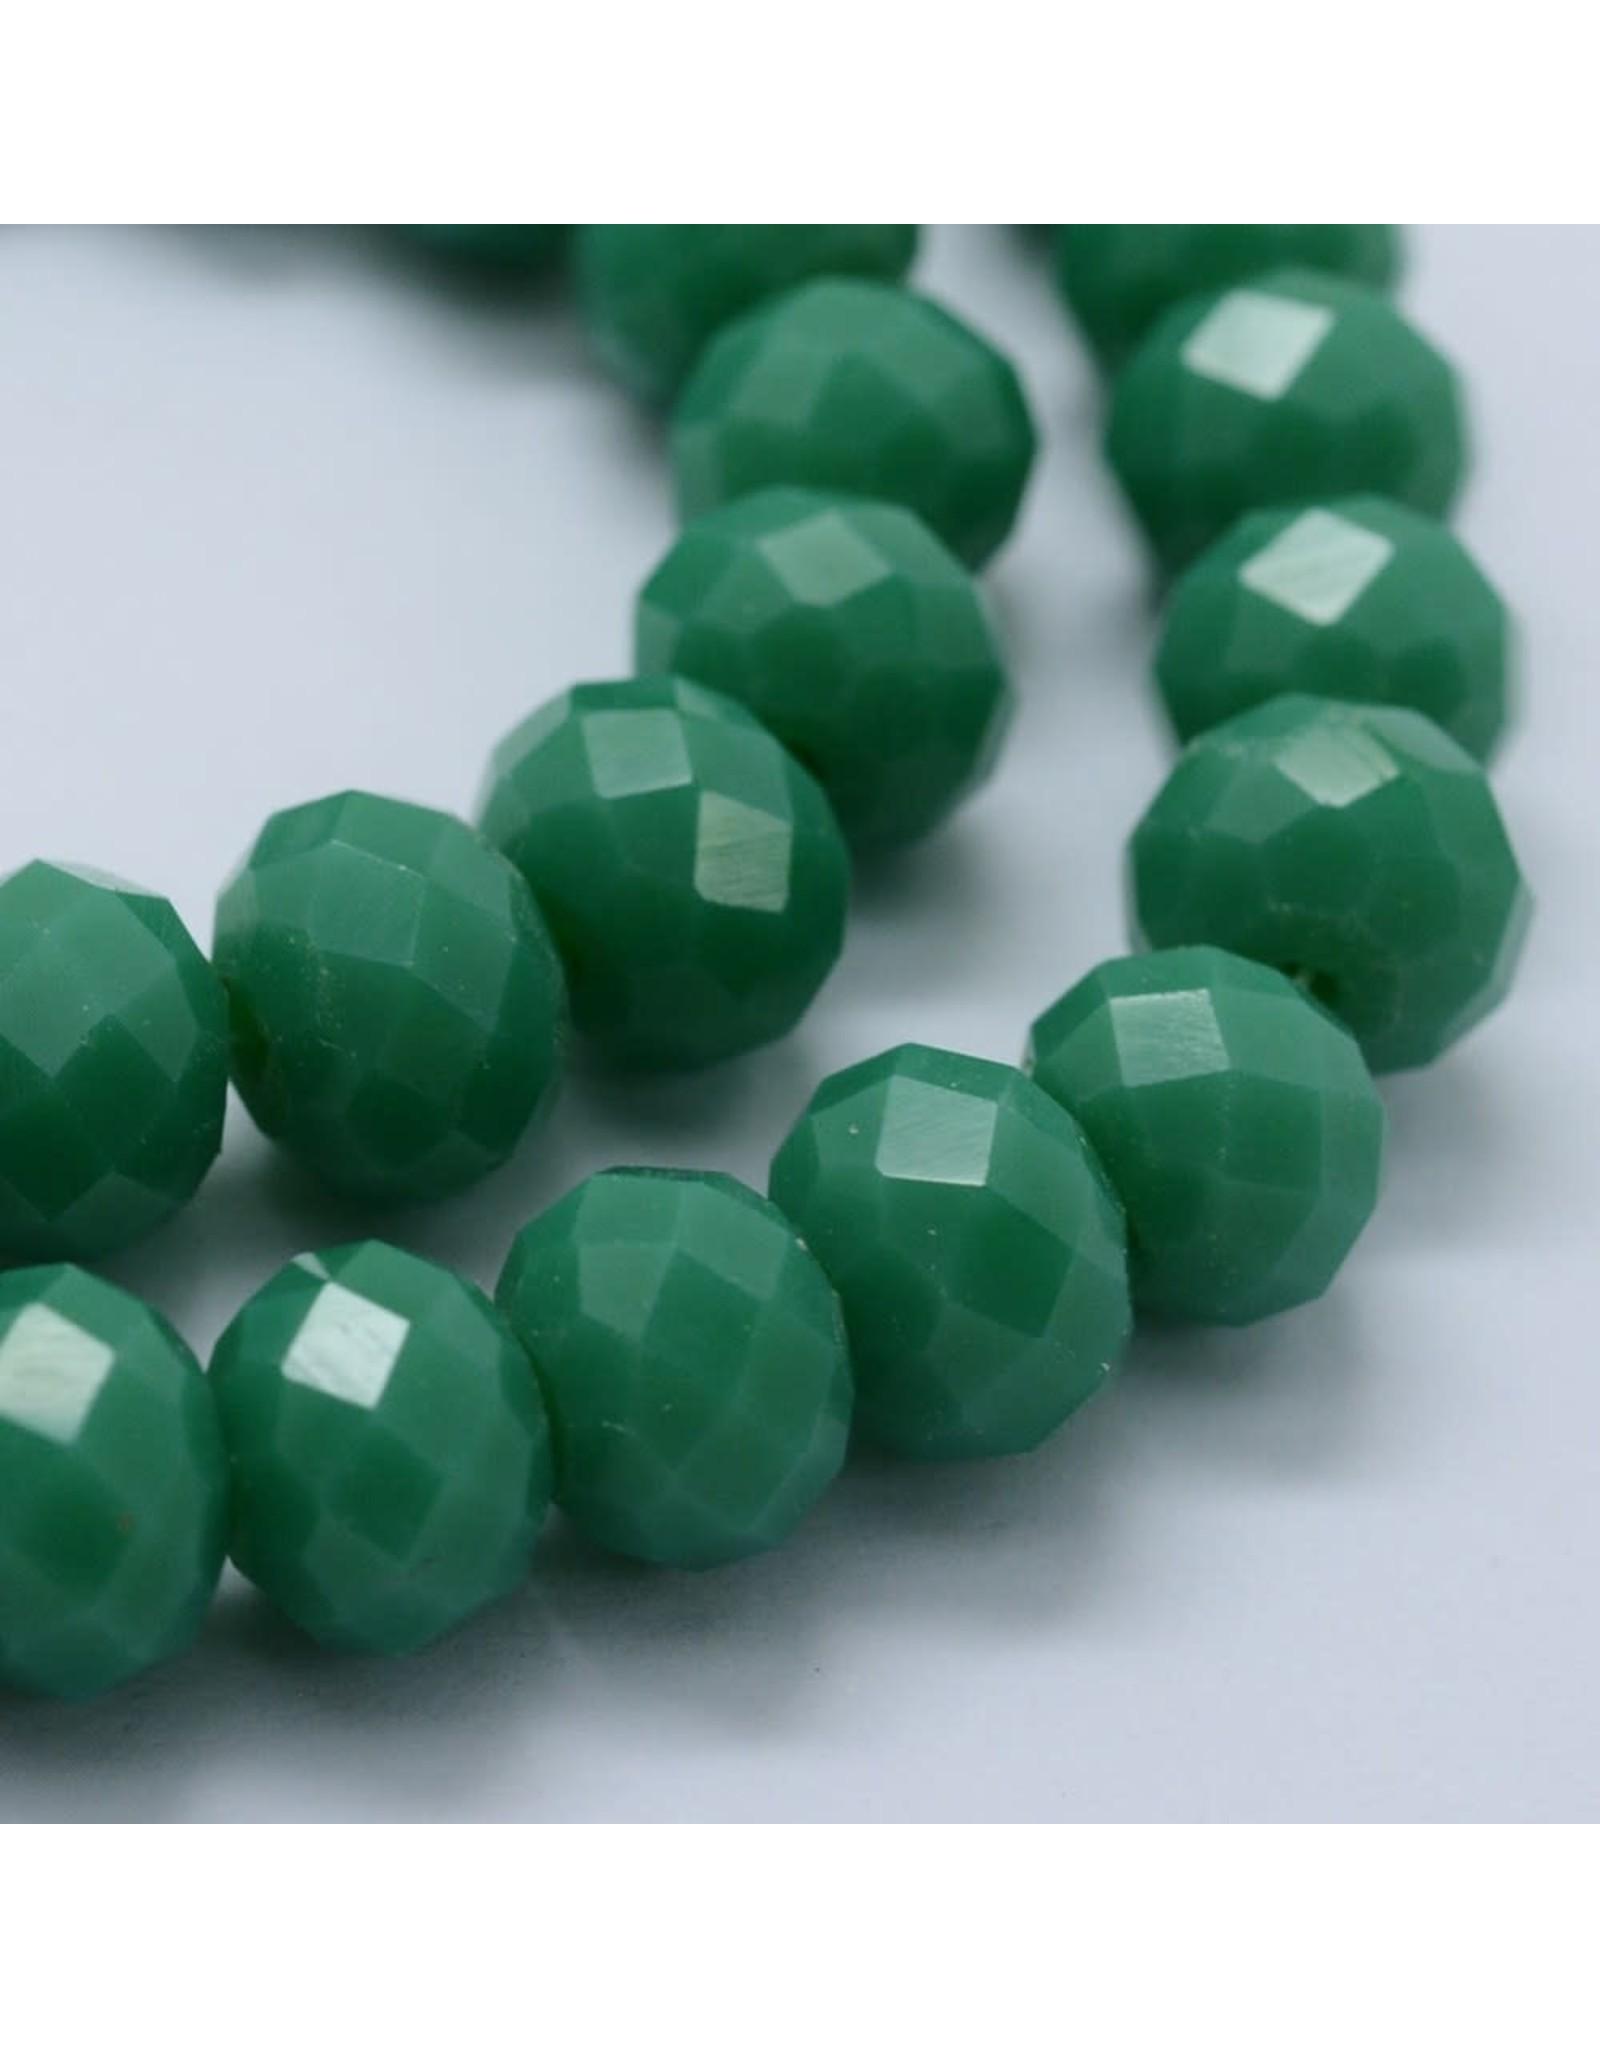 8x6mm Rondelle  Opaque Medium Green  x65